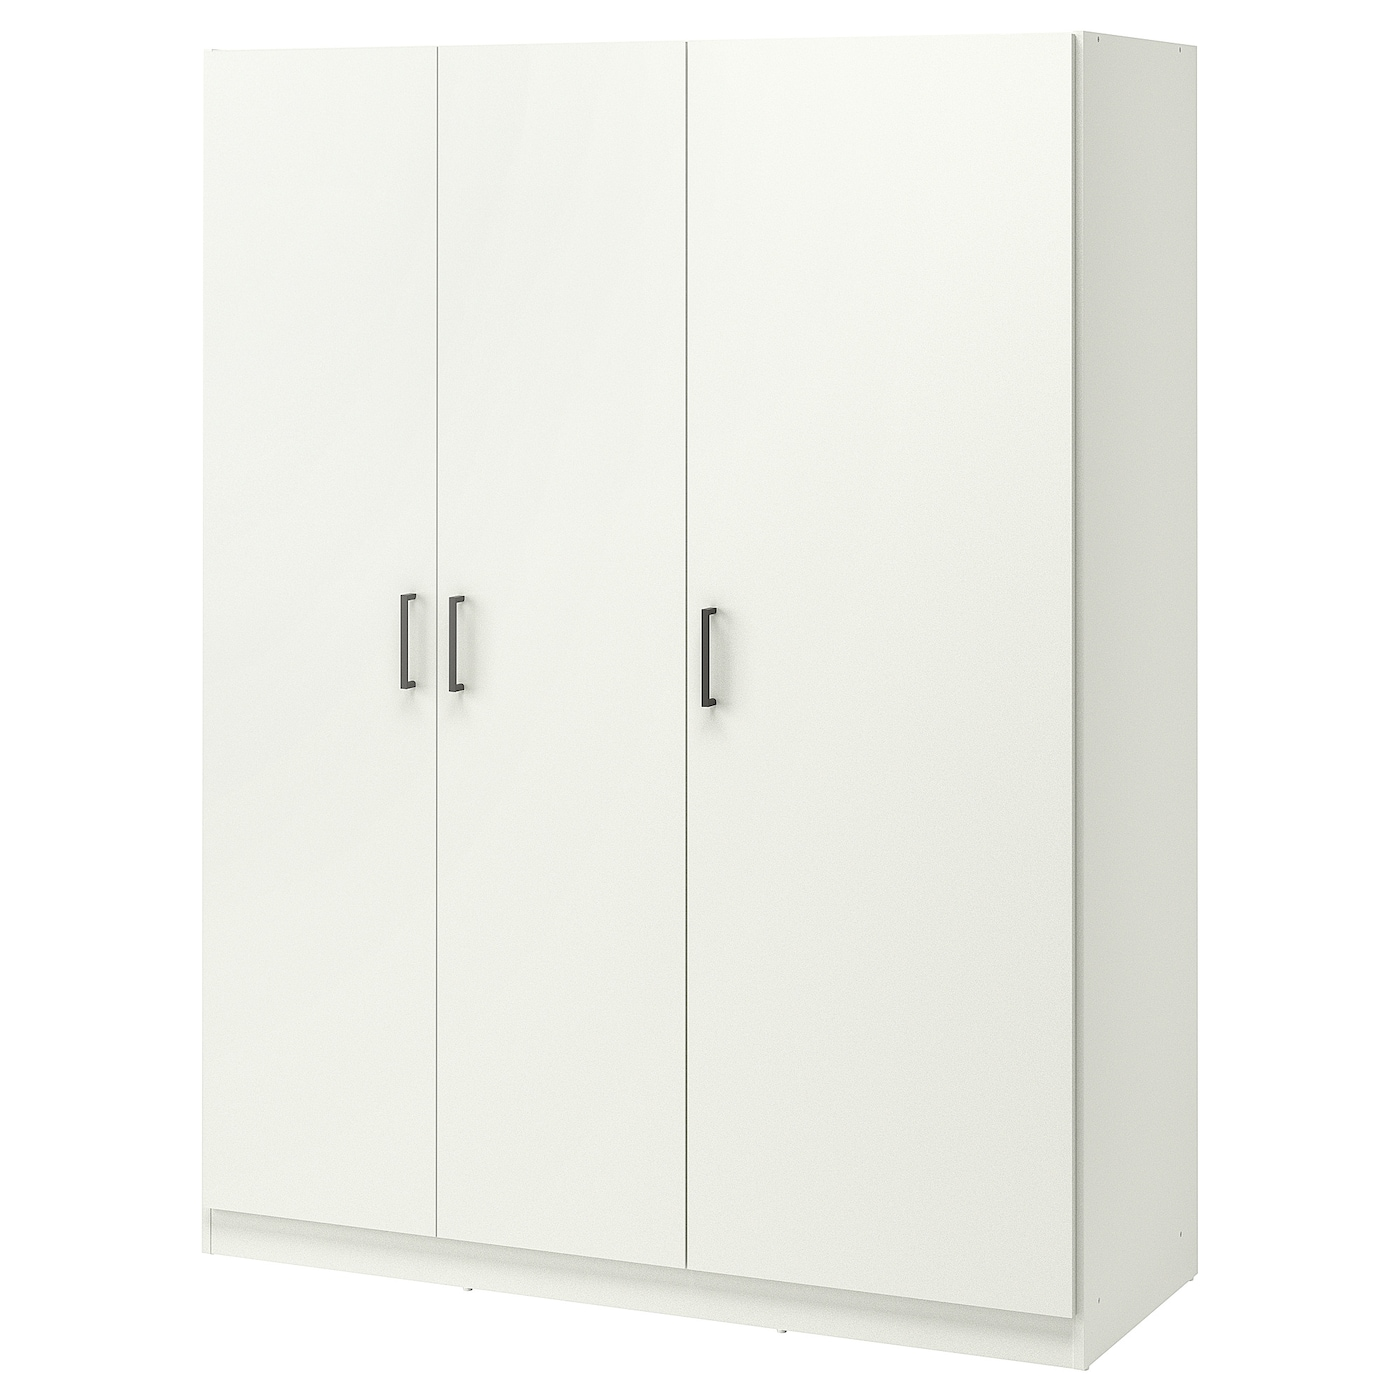 dombÅs armoire-penderie blanc 140 x 181 cm - ikea